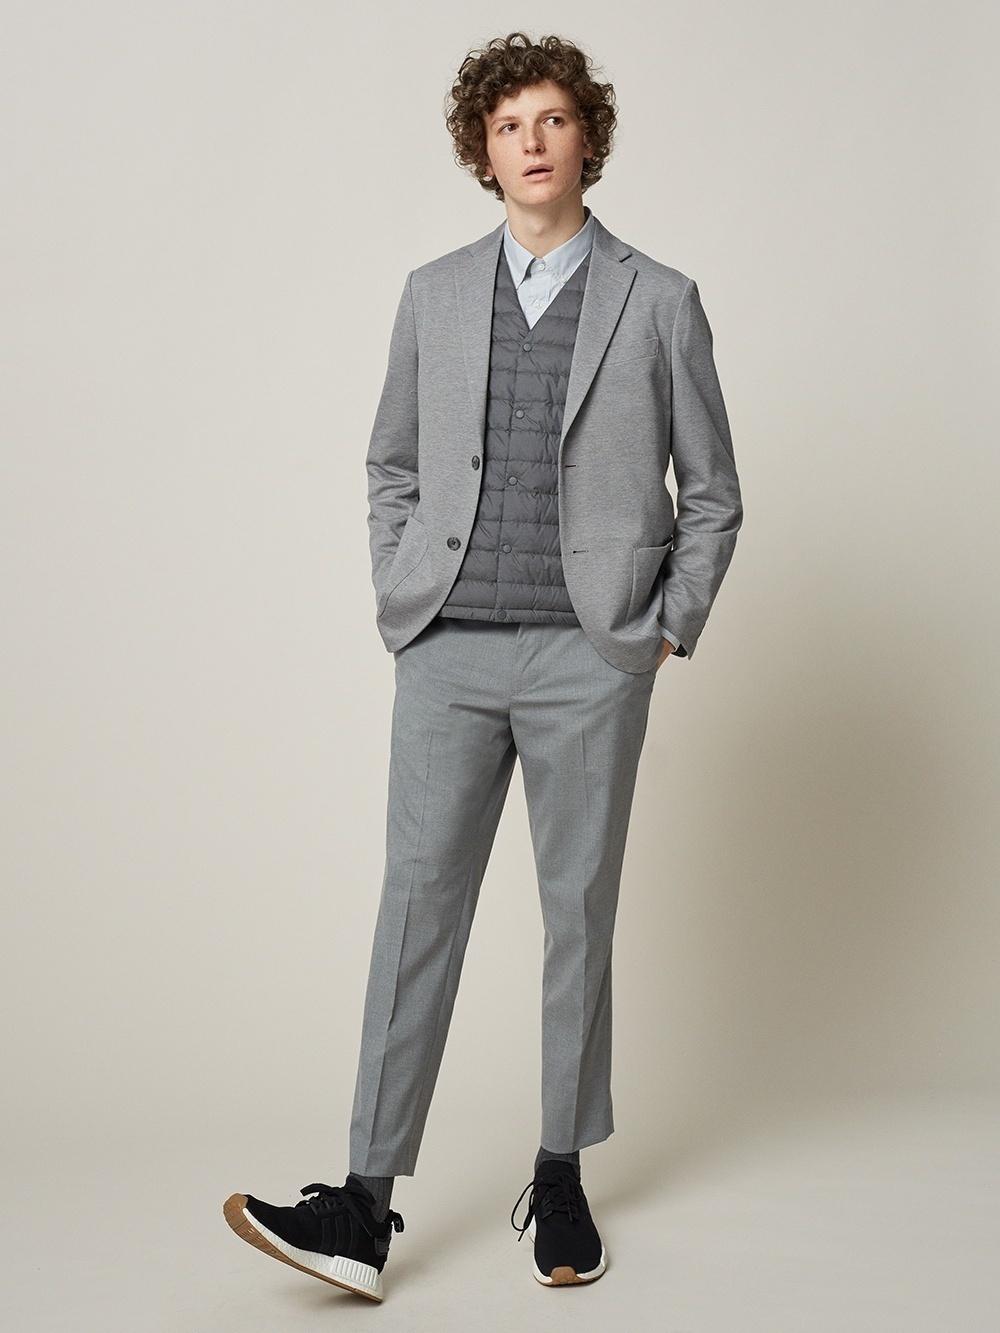 37374b3822 Men s Grey Gilet